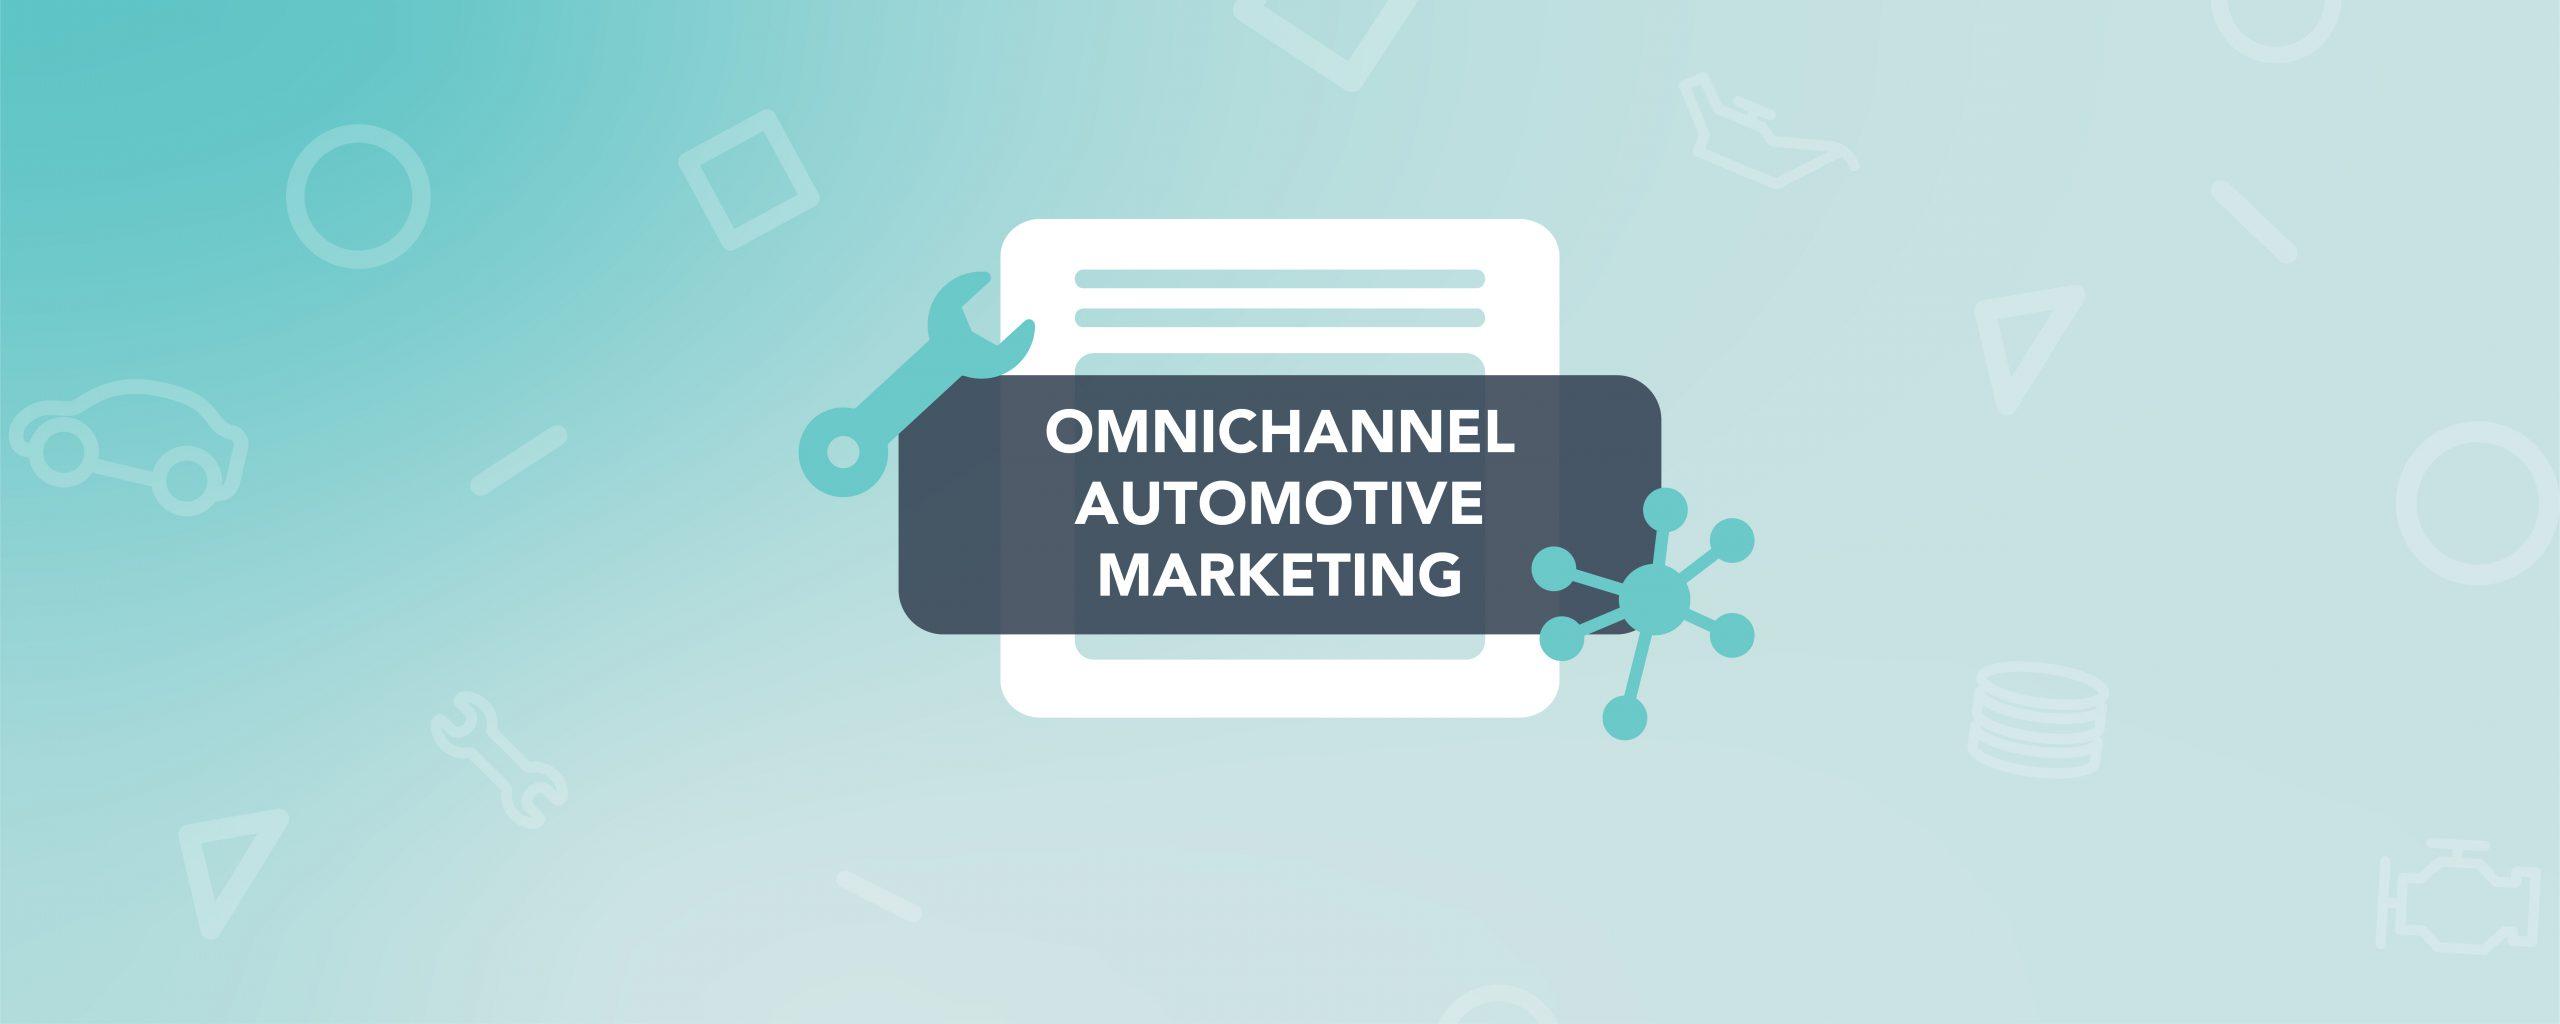 Omnichannel Automotive Marketing